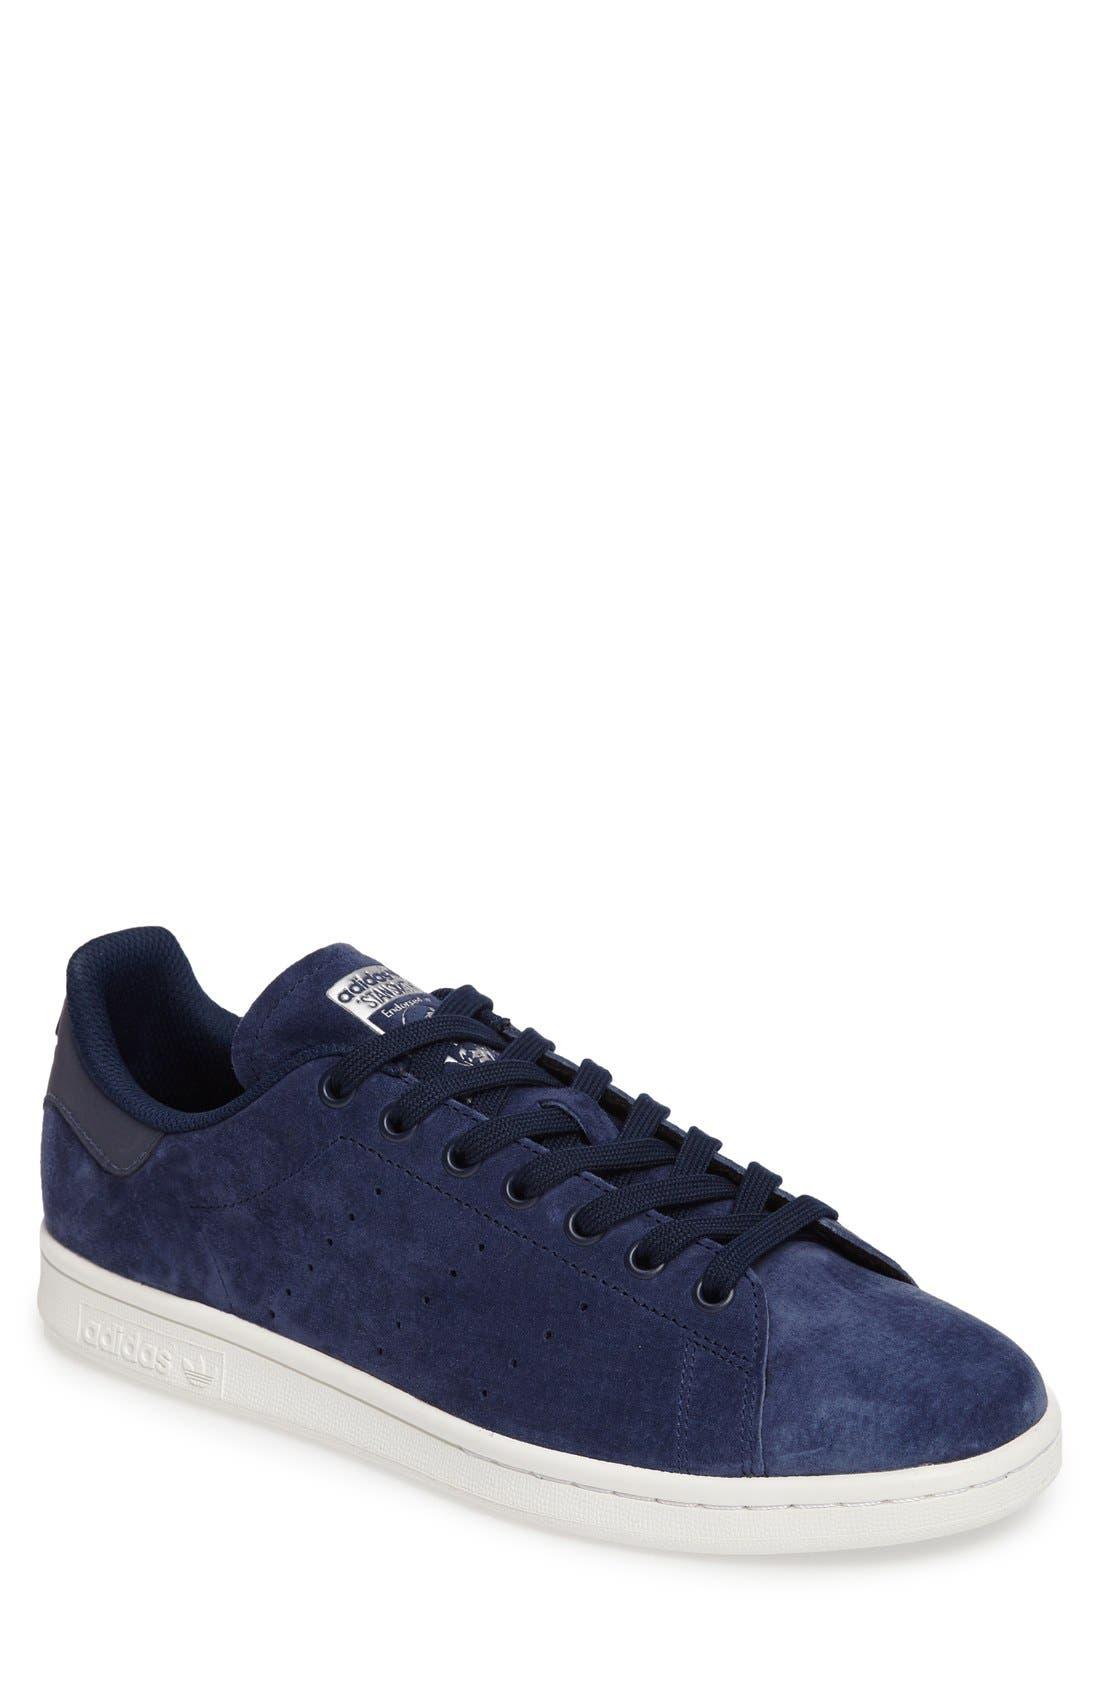 Alternate Image 1 Selected - adidas Stan Smith Sneaker (Women)